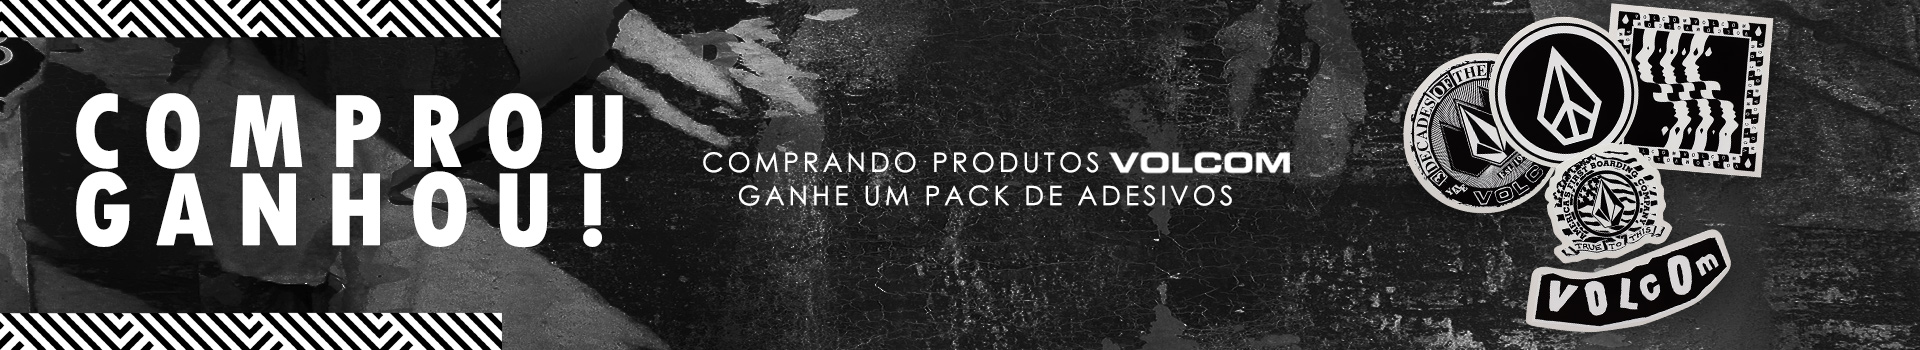 PROMOÇAO VOLCOM